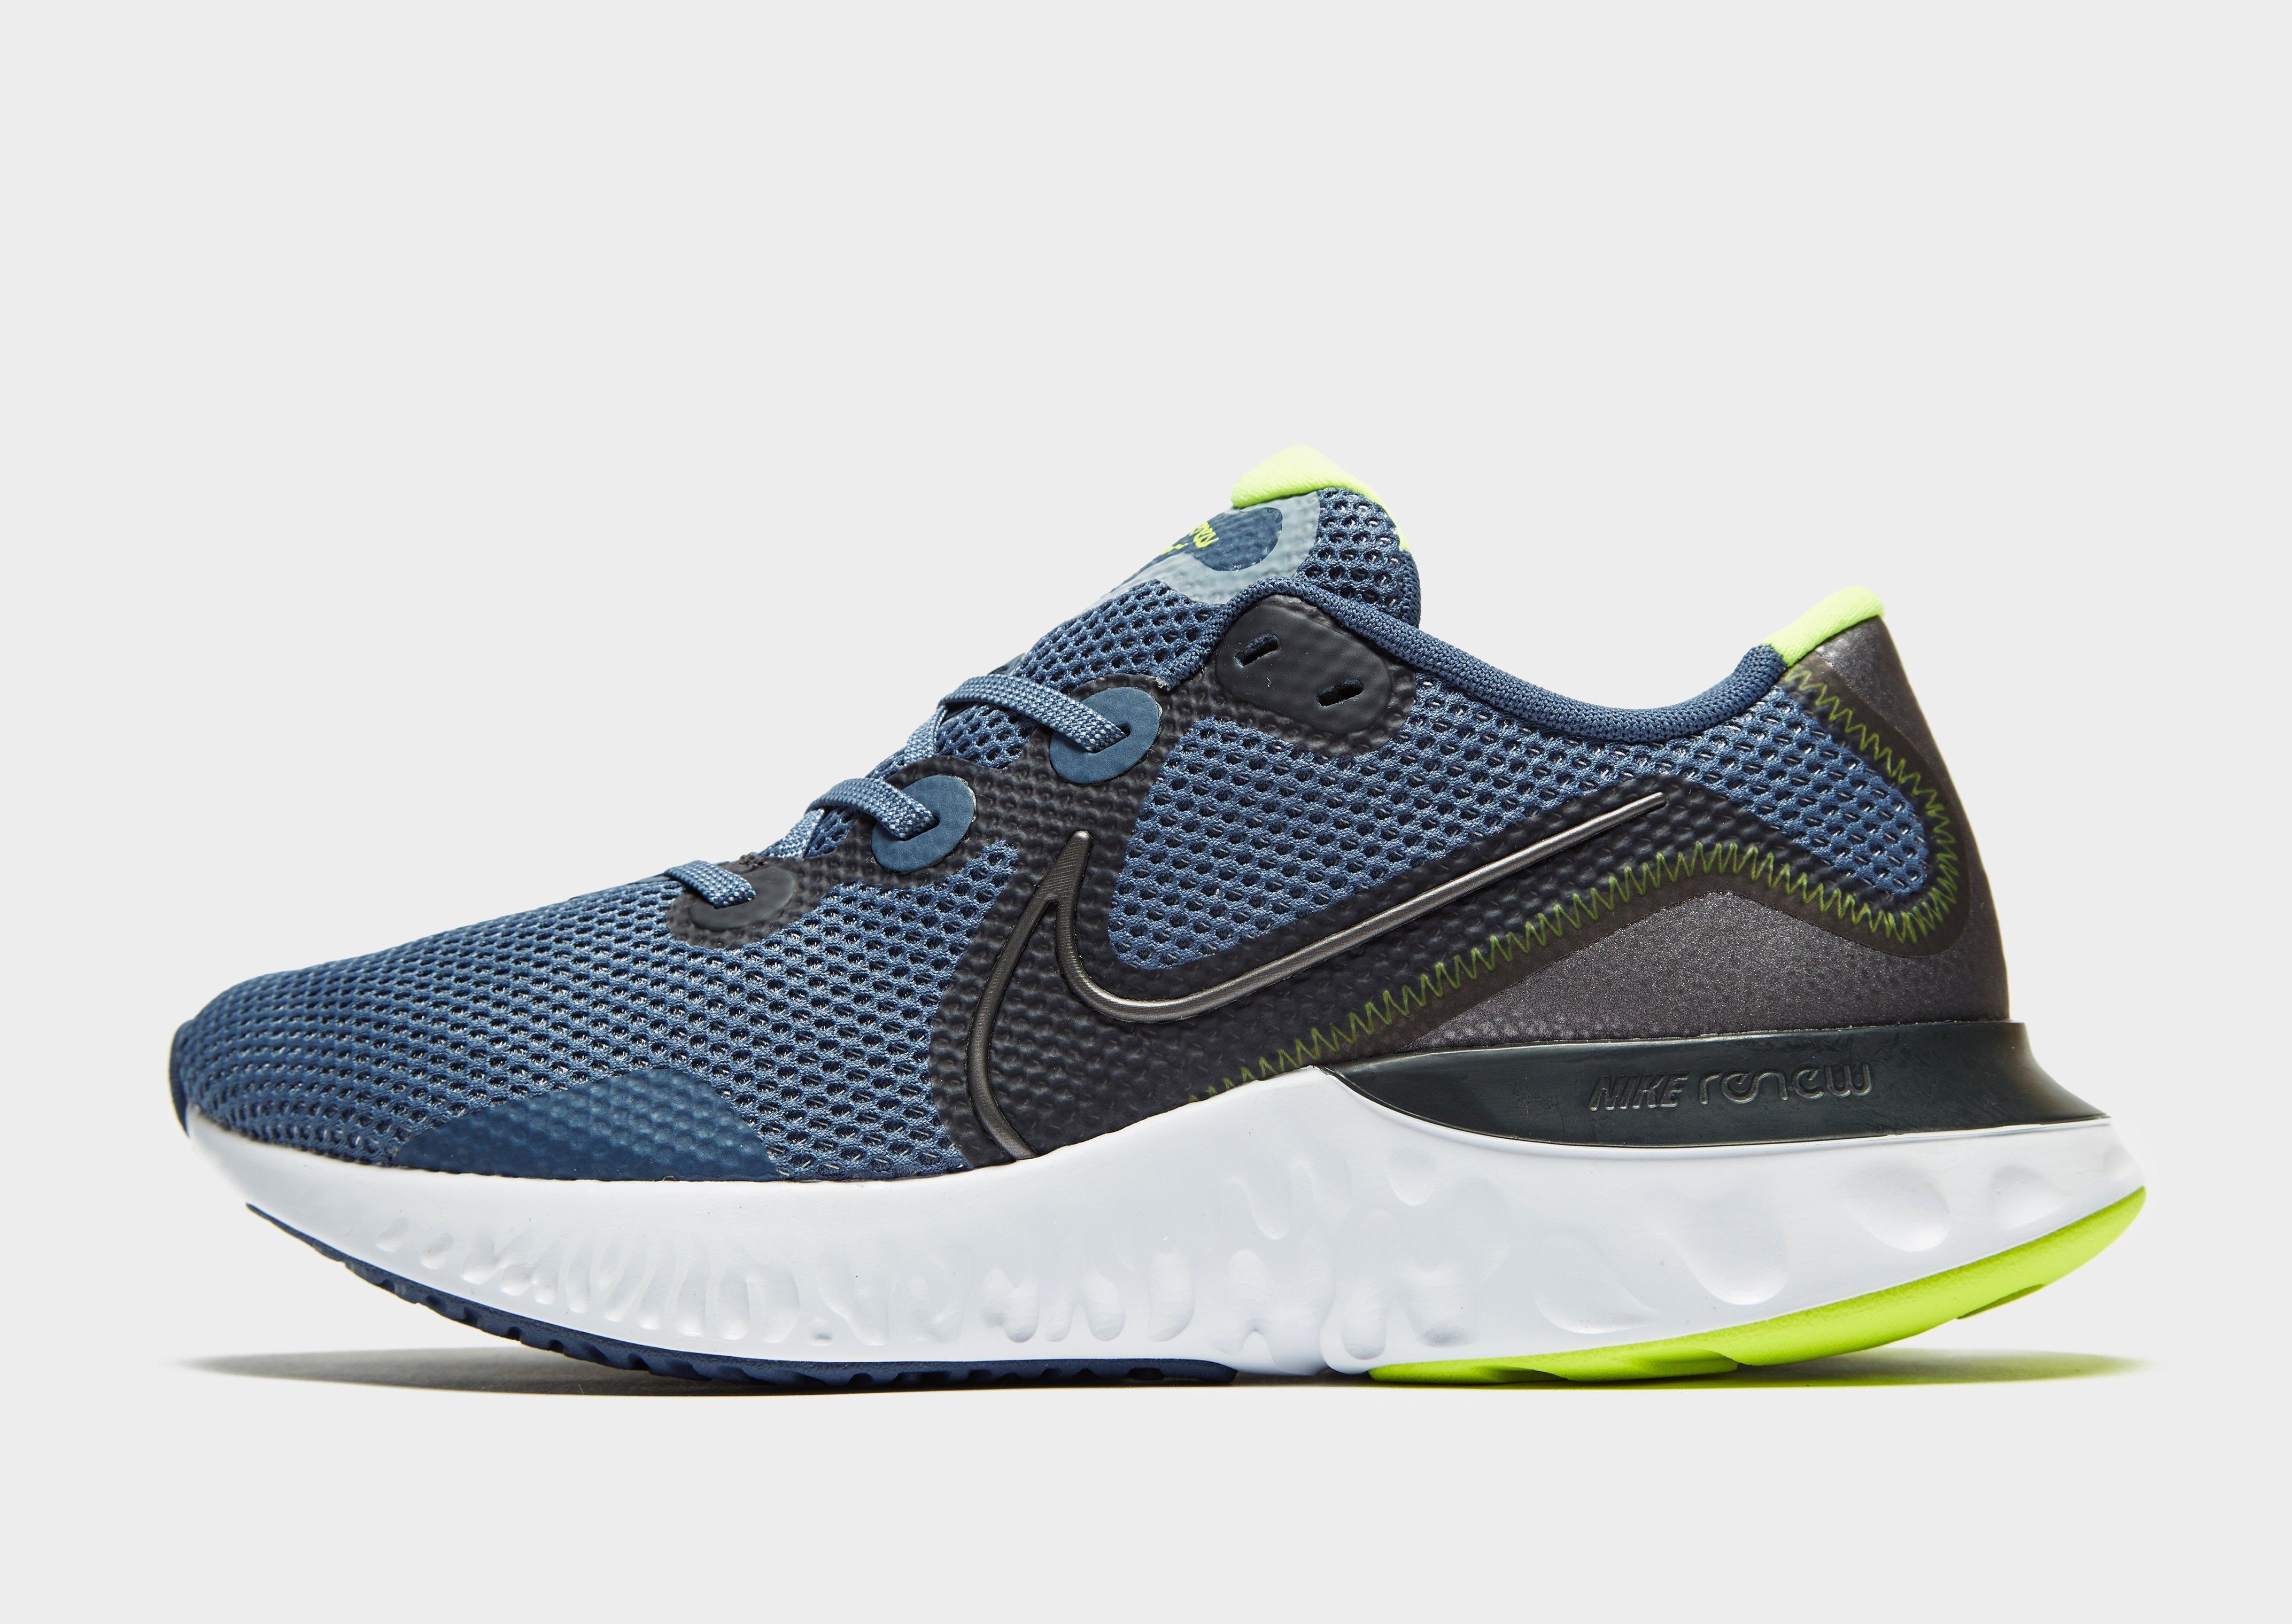 Nike New Nike Air Max Ltd 3 White Neutral Grey Black Men'